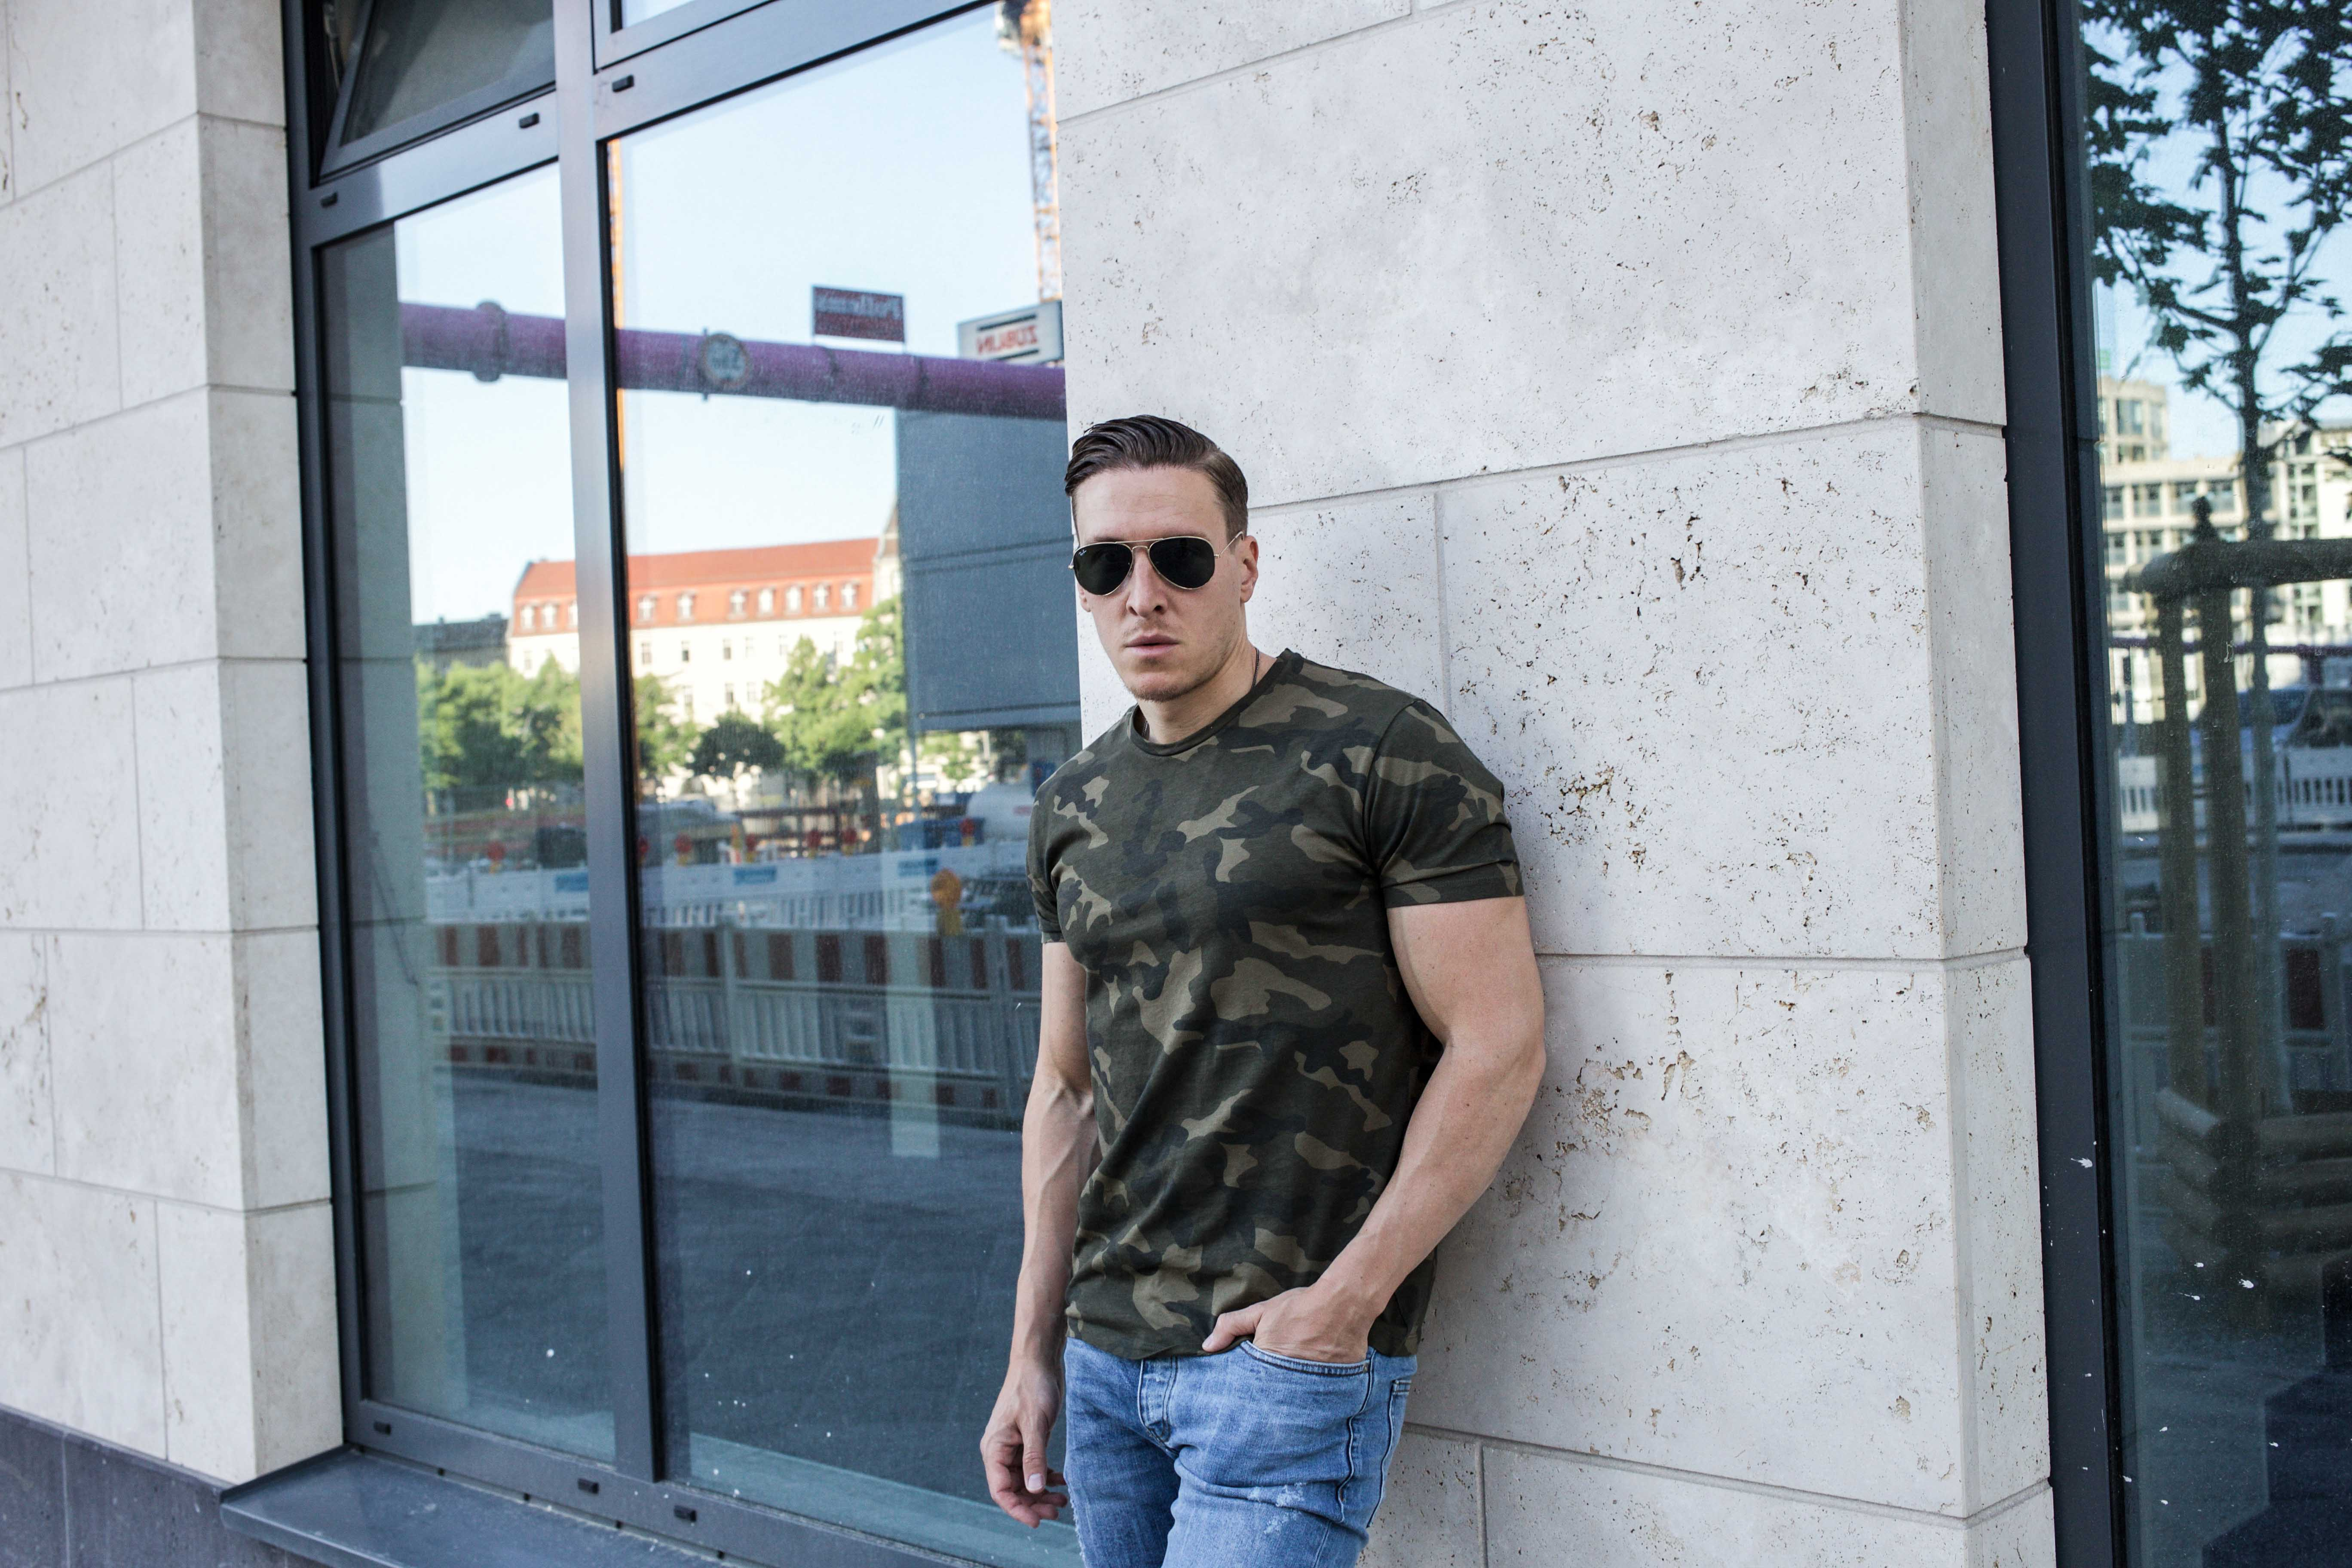 camouflage-braun-erdtöne-boots-ripped-jeans-männer-lifestyle-modeblog_6921